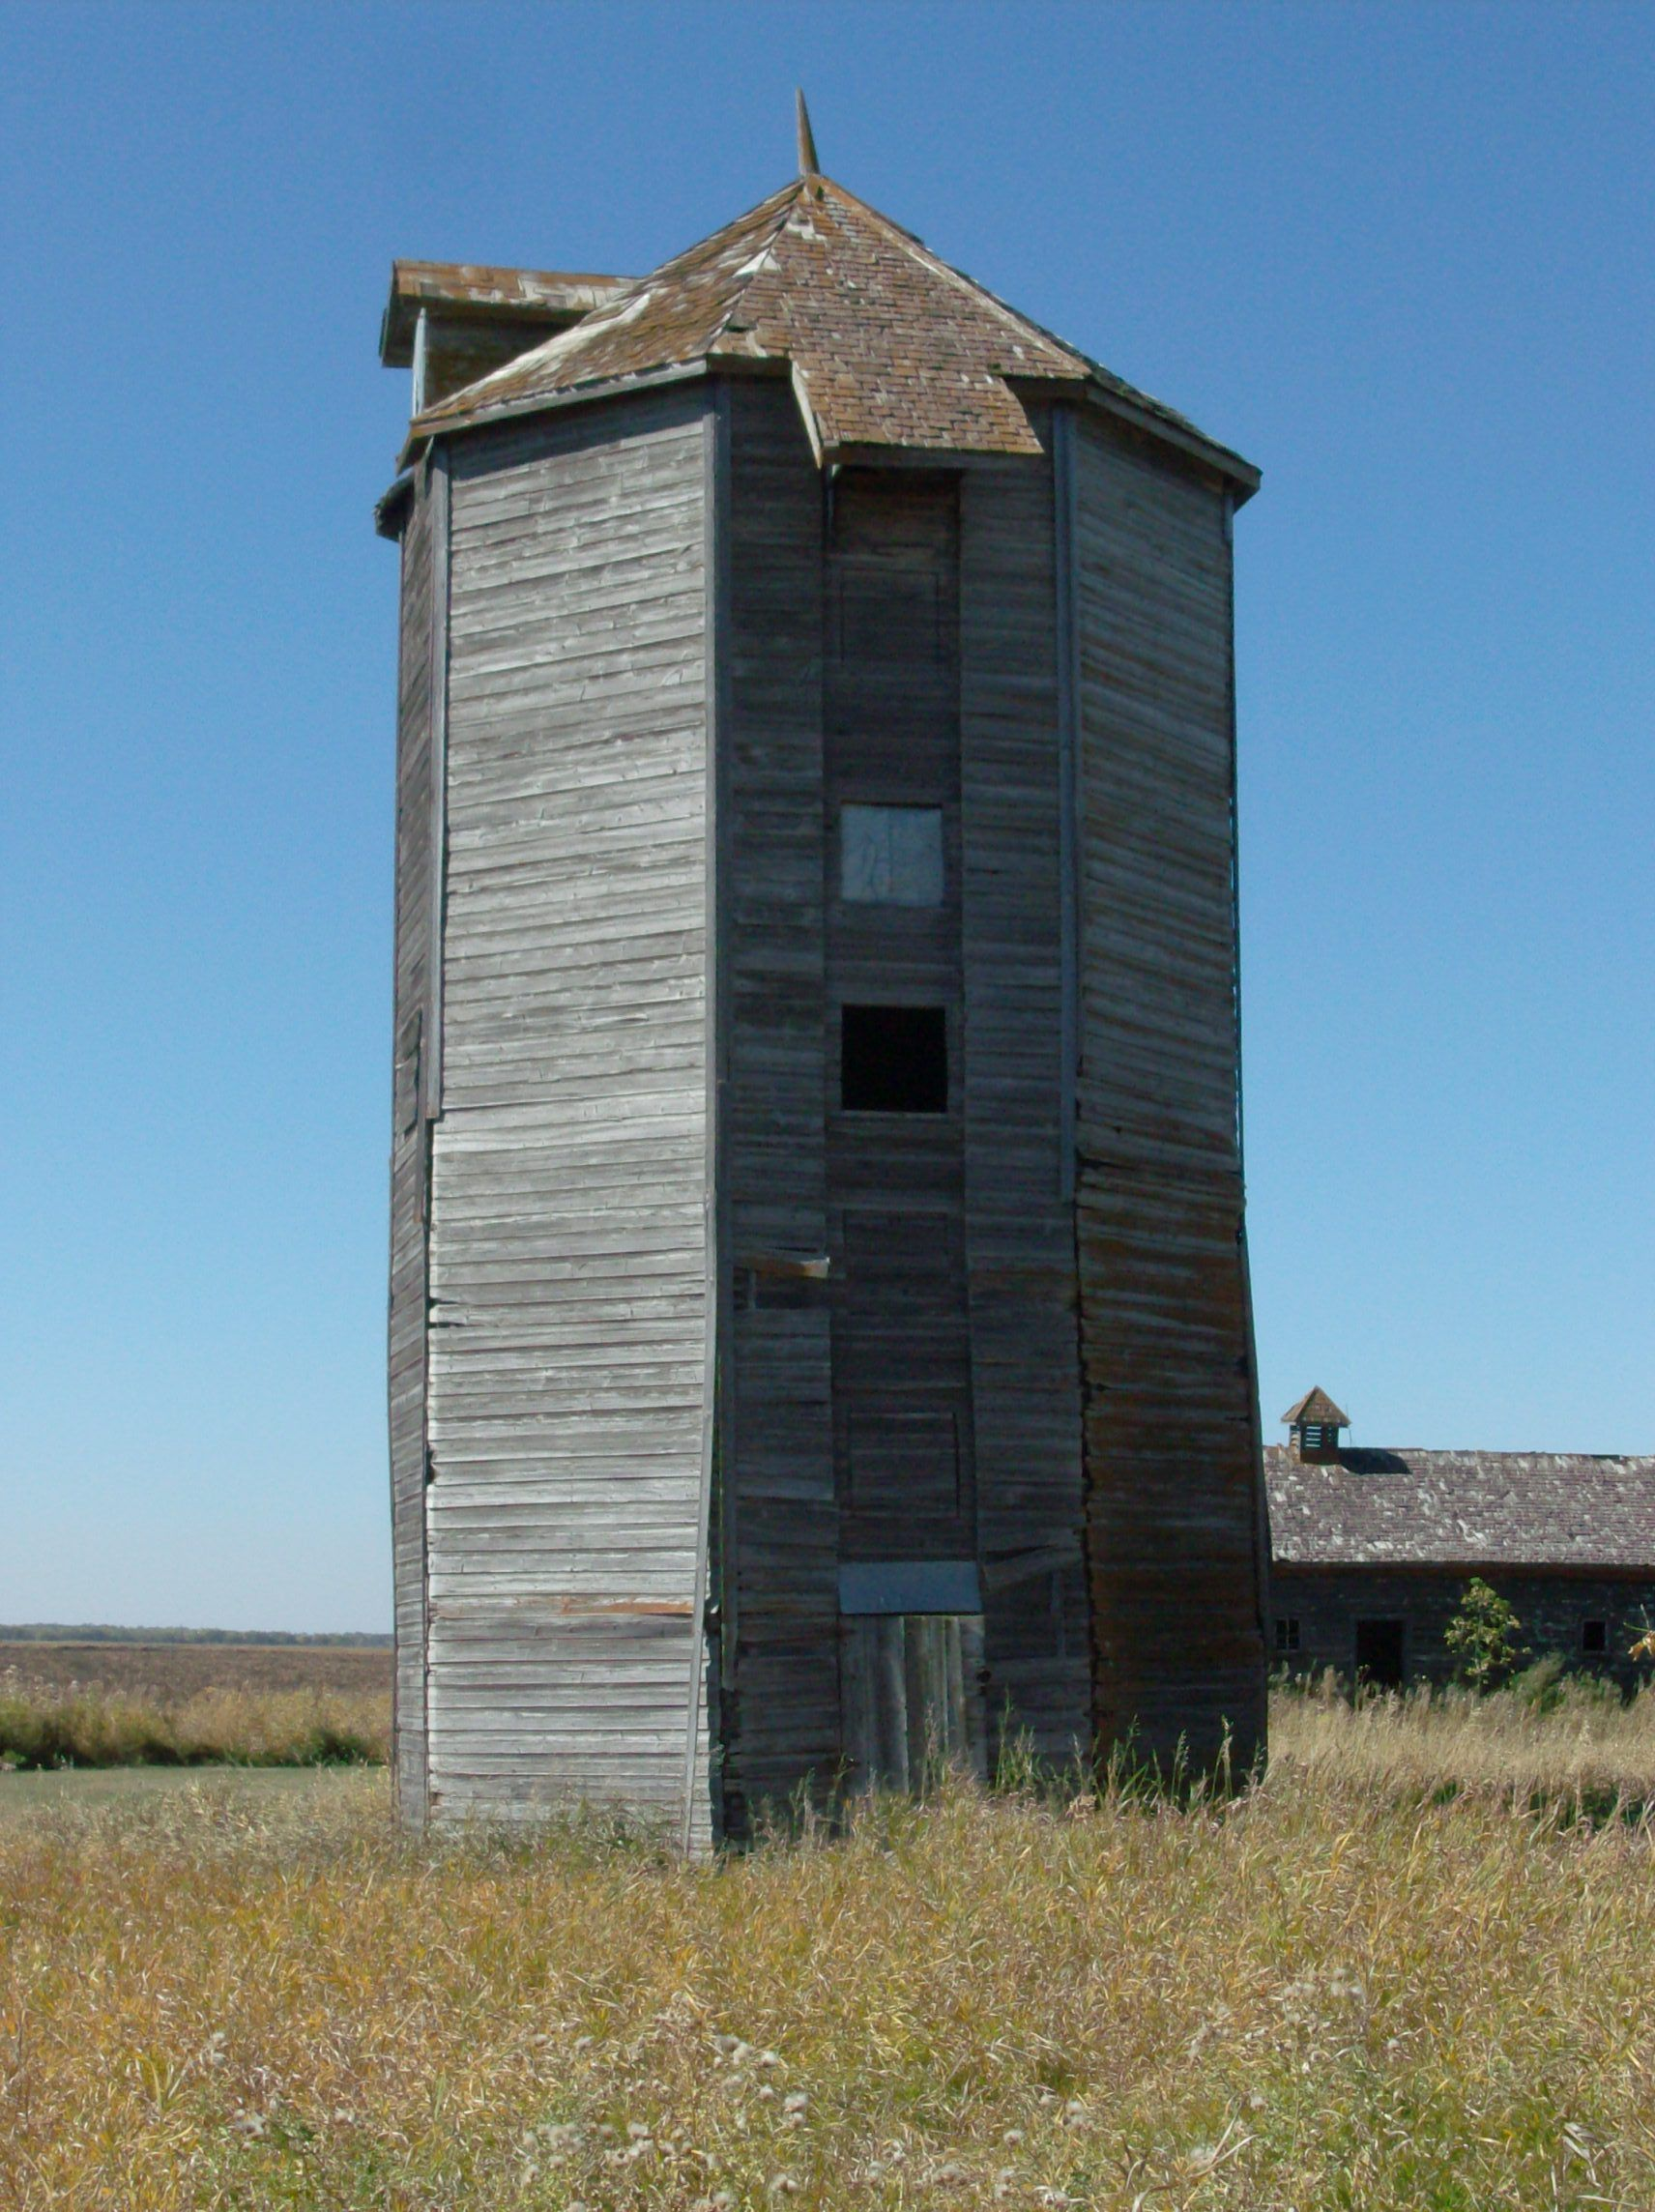 Manitoba Heritage Building – Octagonal Grain Silo | Pinterest